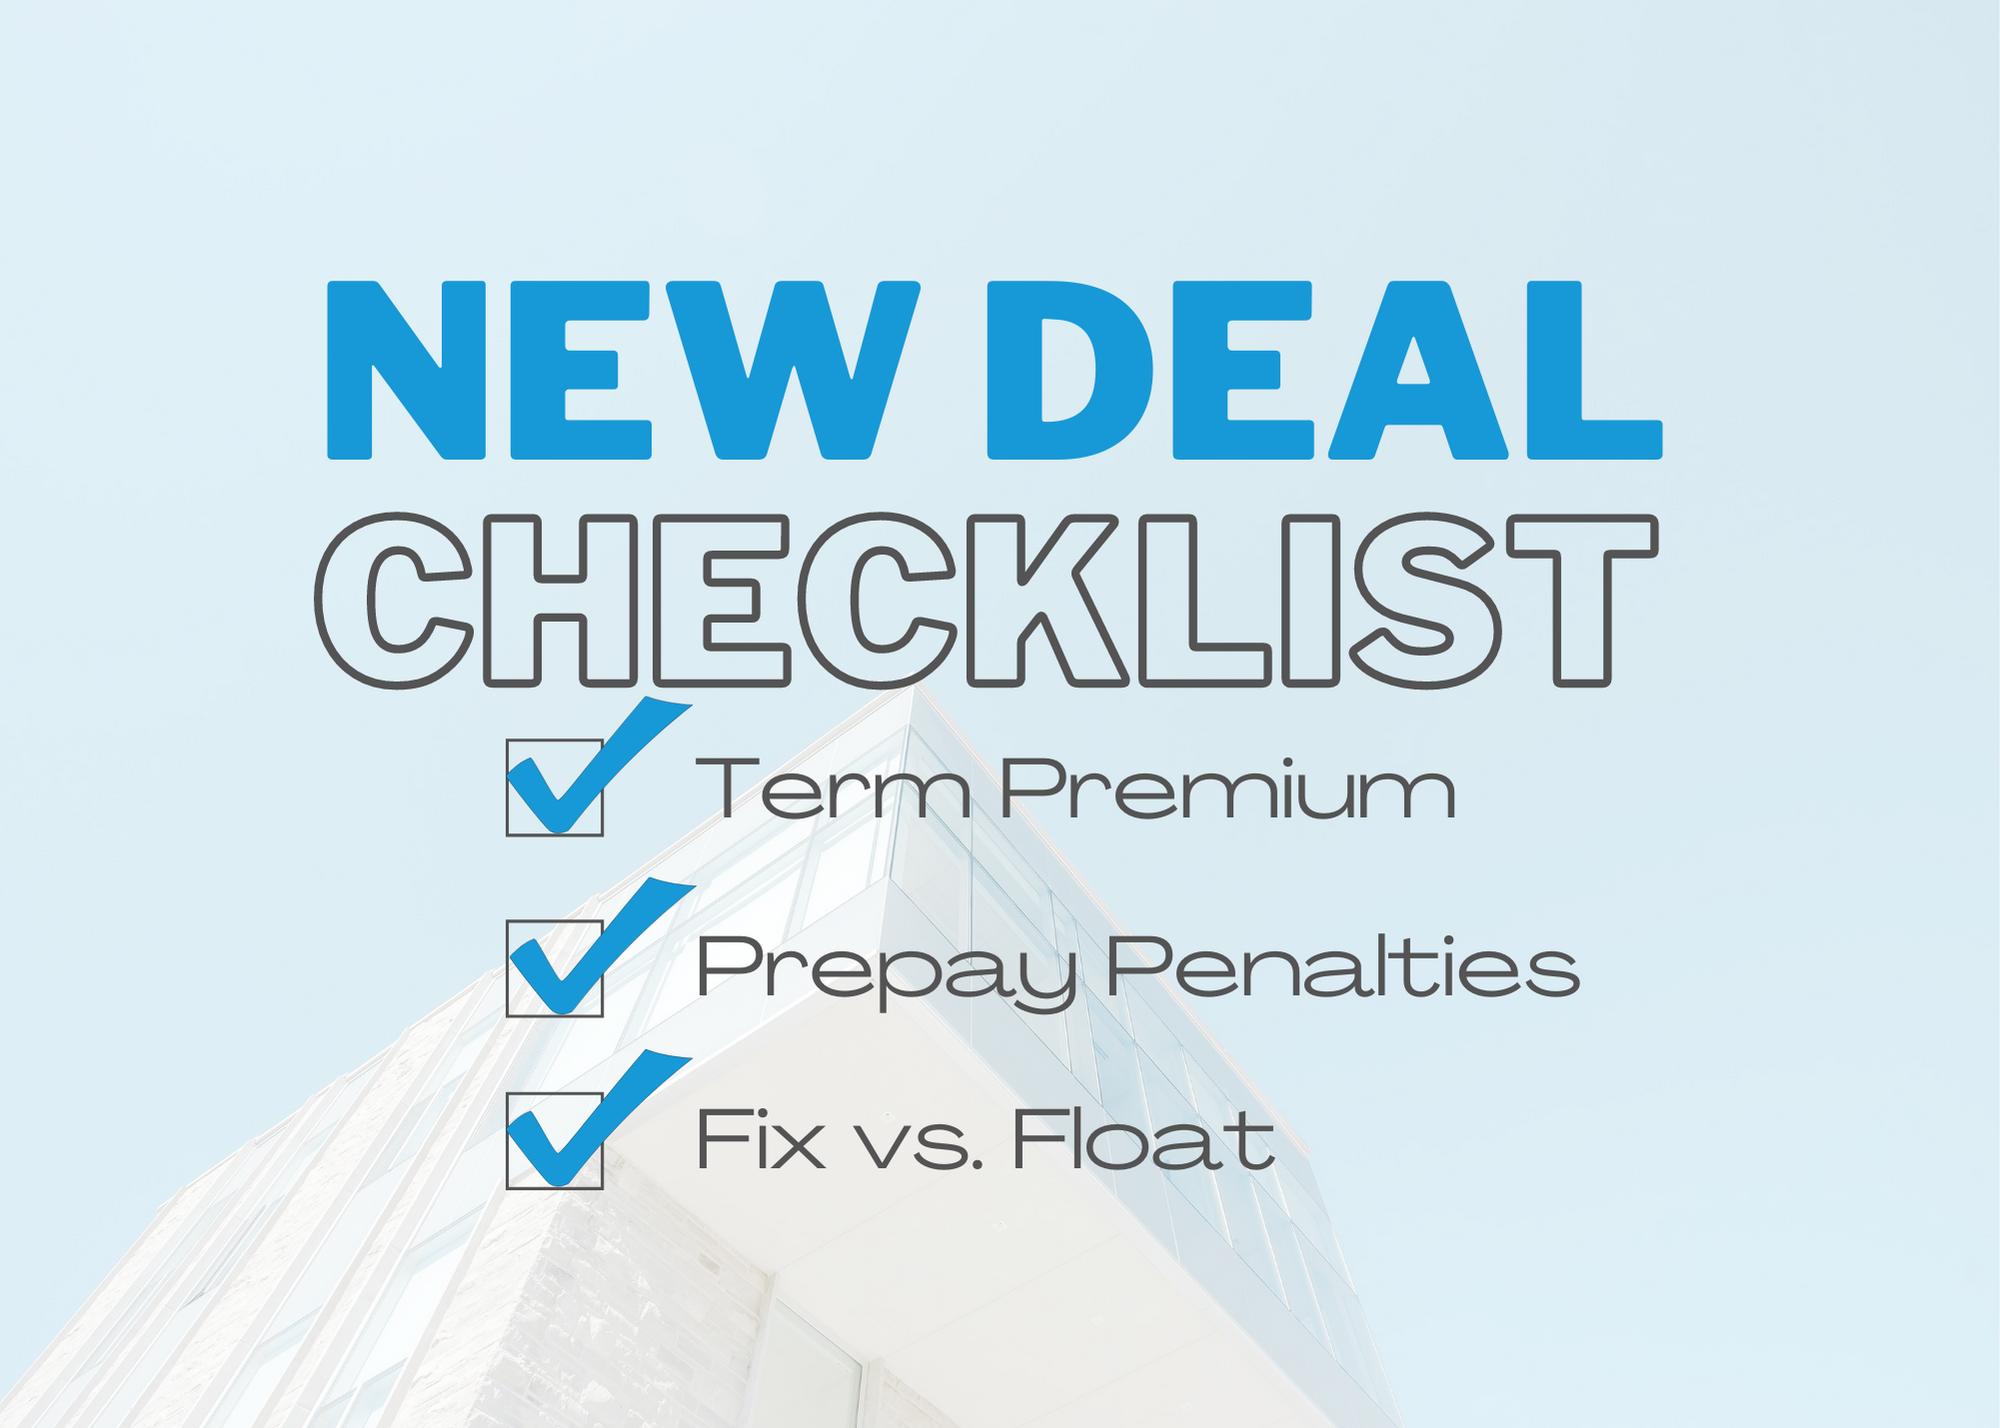 new deal checklist, term premium, prepayment penalties, and fix v float rate